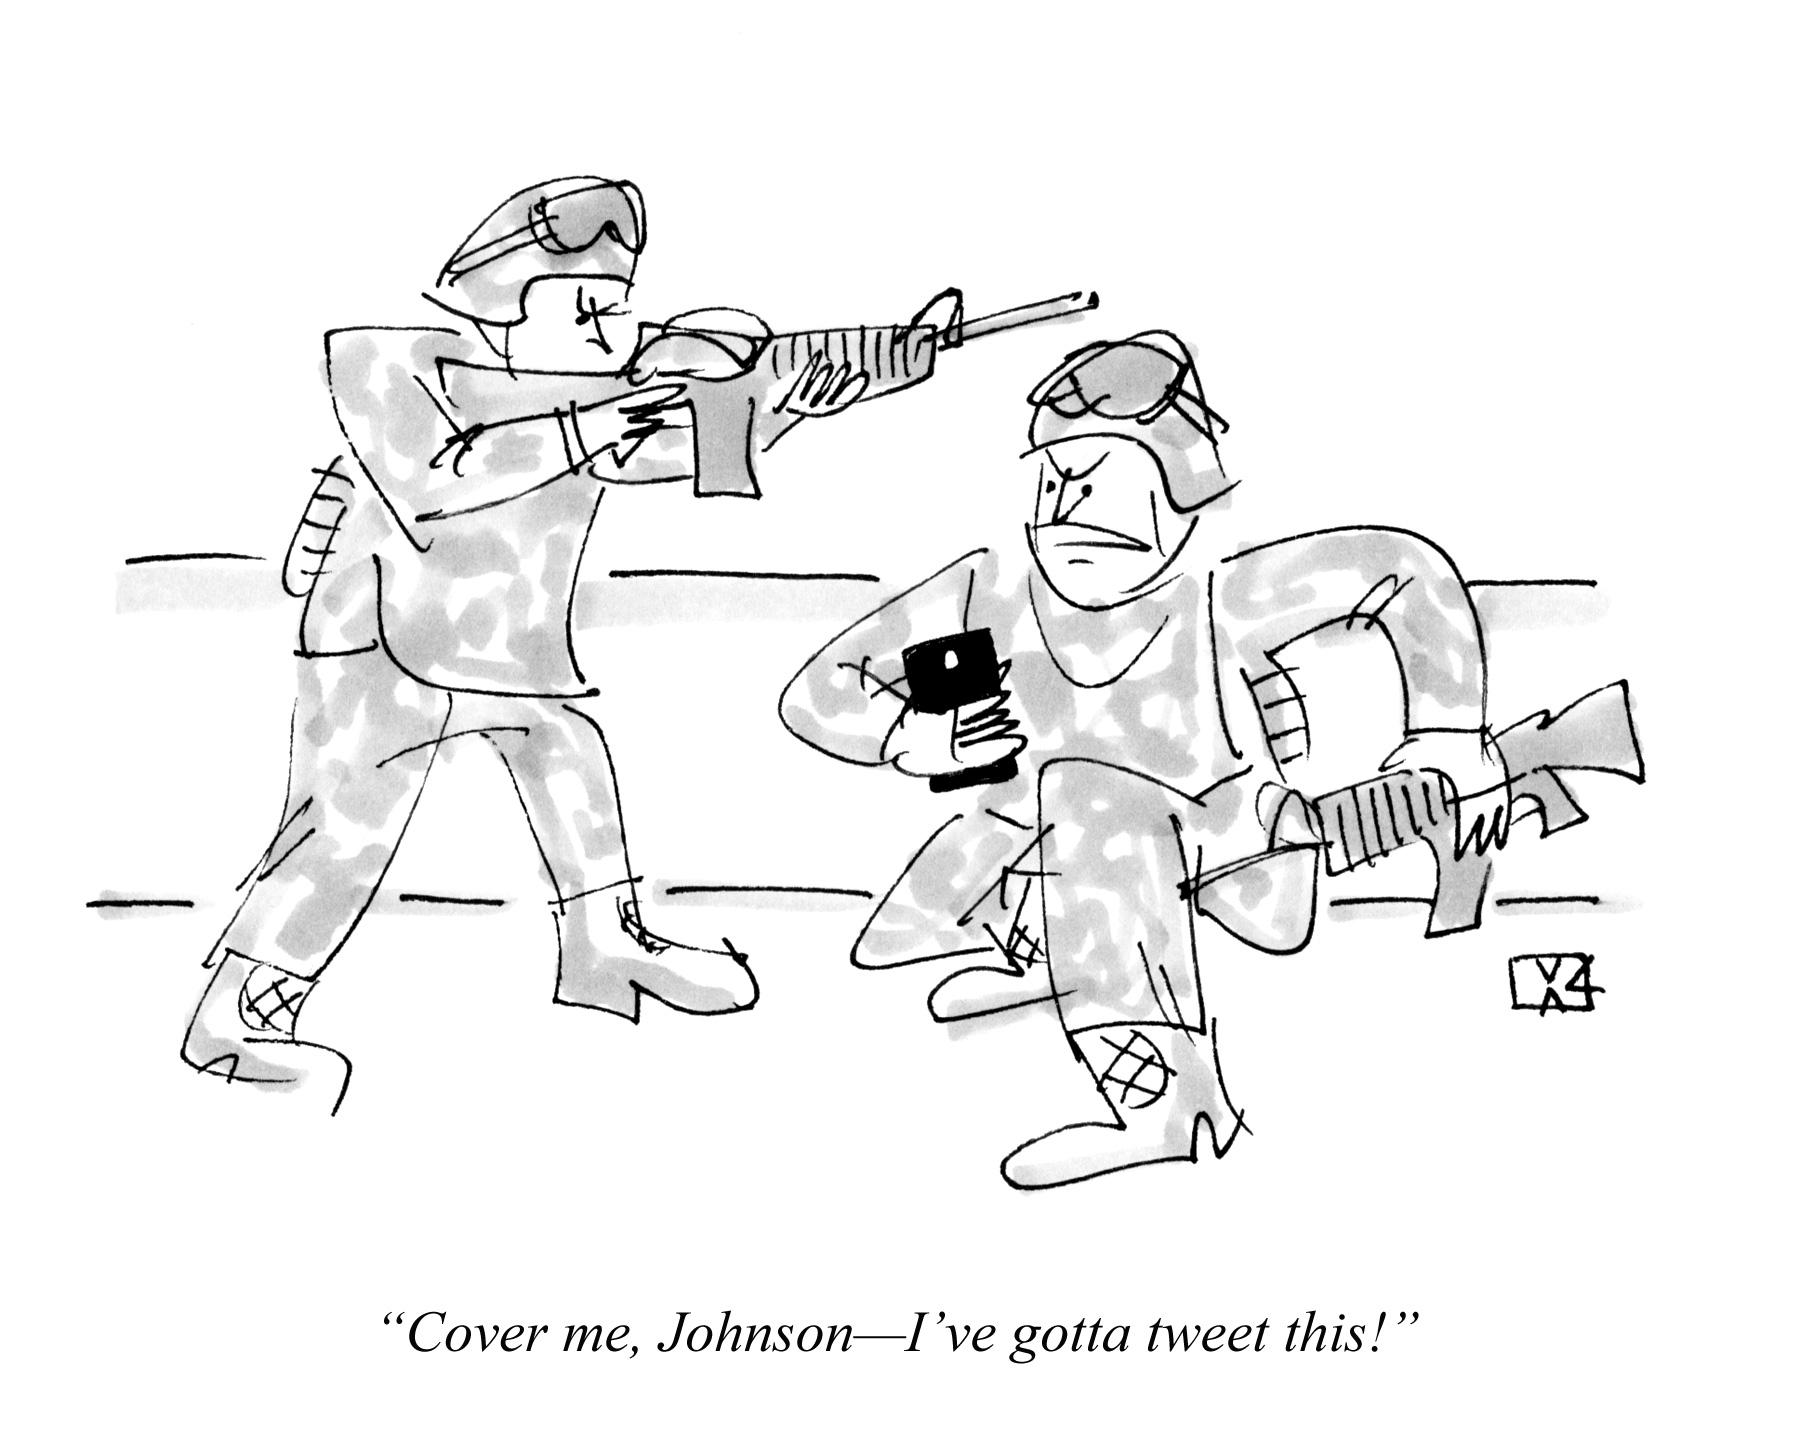 Cover me, Johnson--I've gotta tweet this!